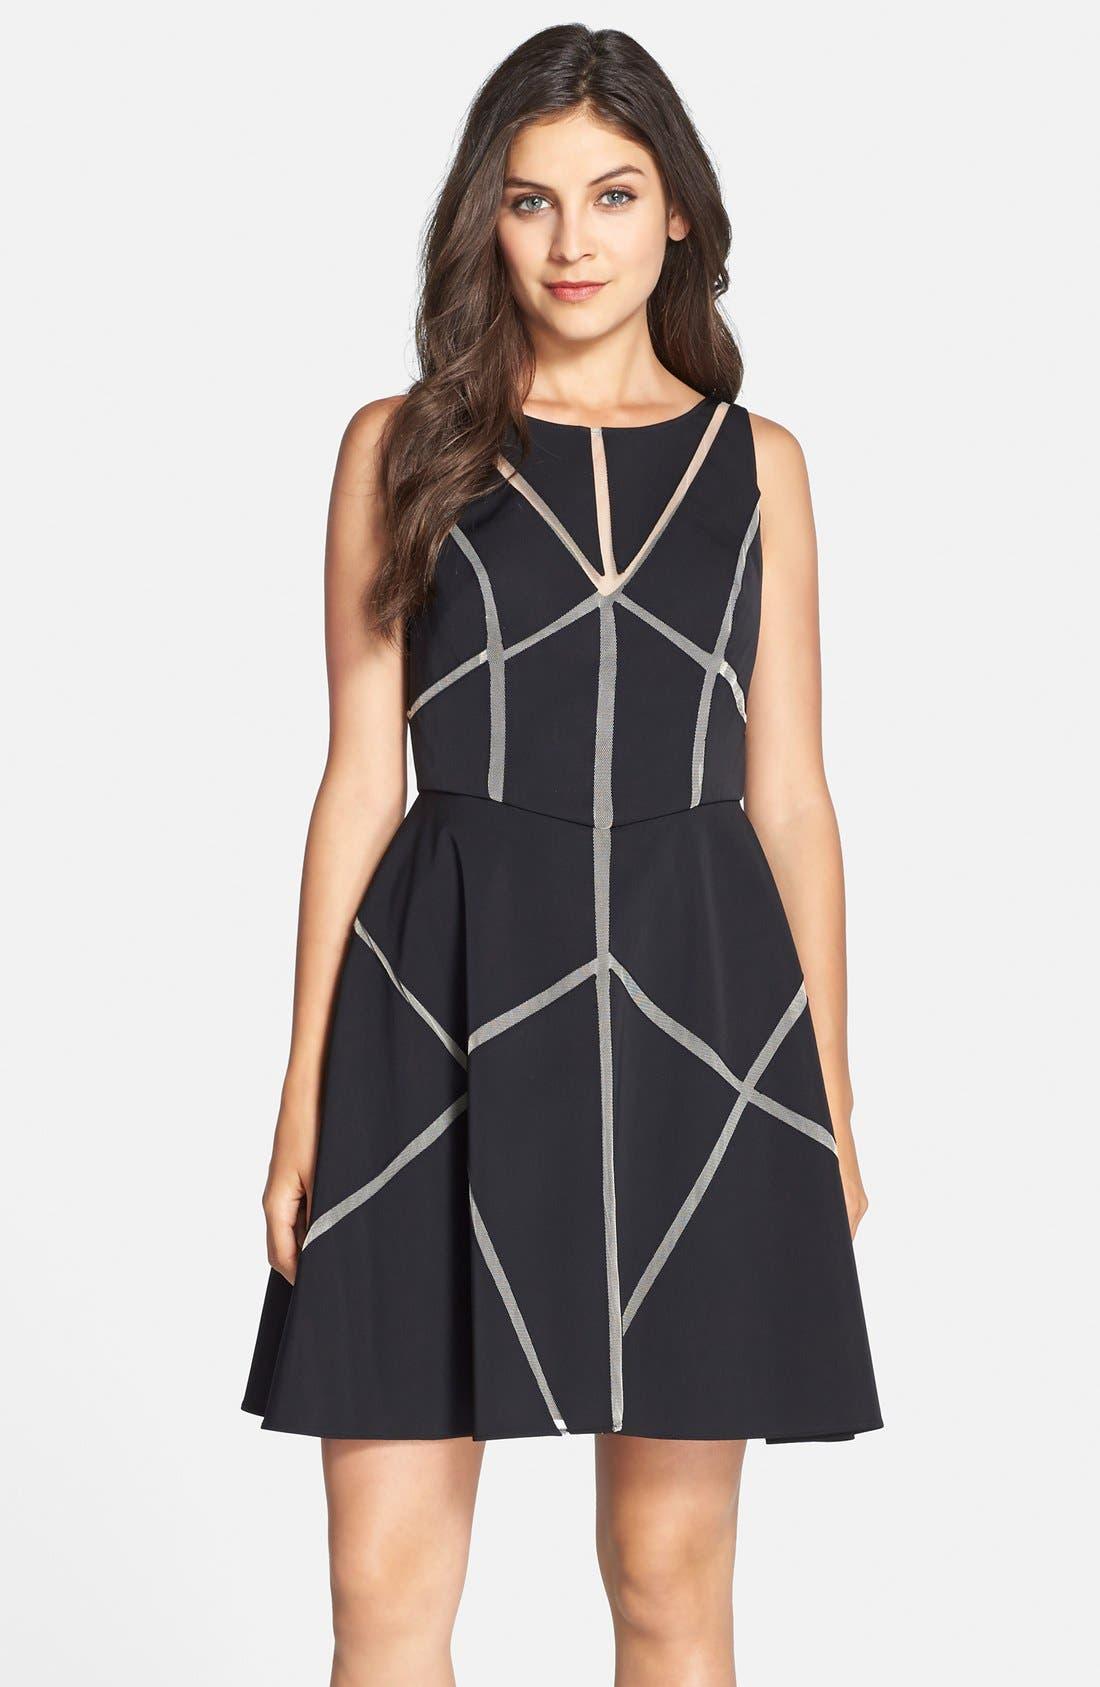 Alternate Image 1 Selected - Aidan Mattox Cutout Satin Fit & Flare Dress